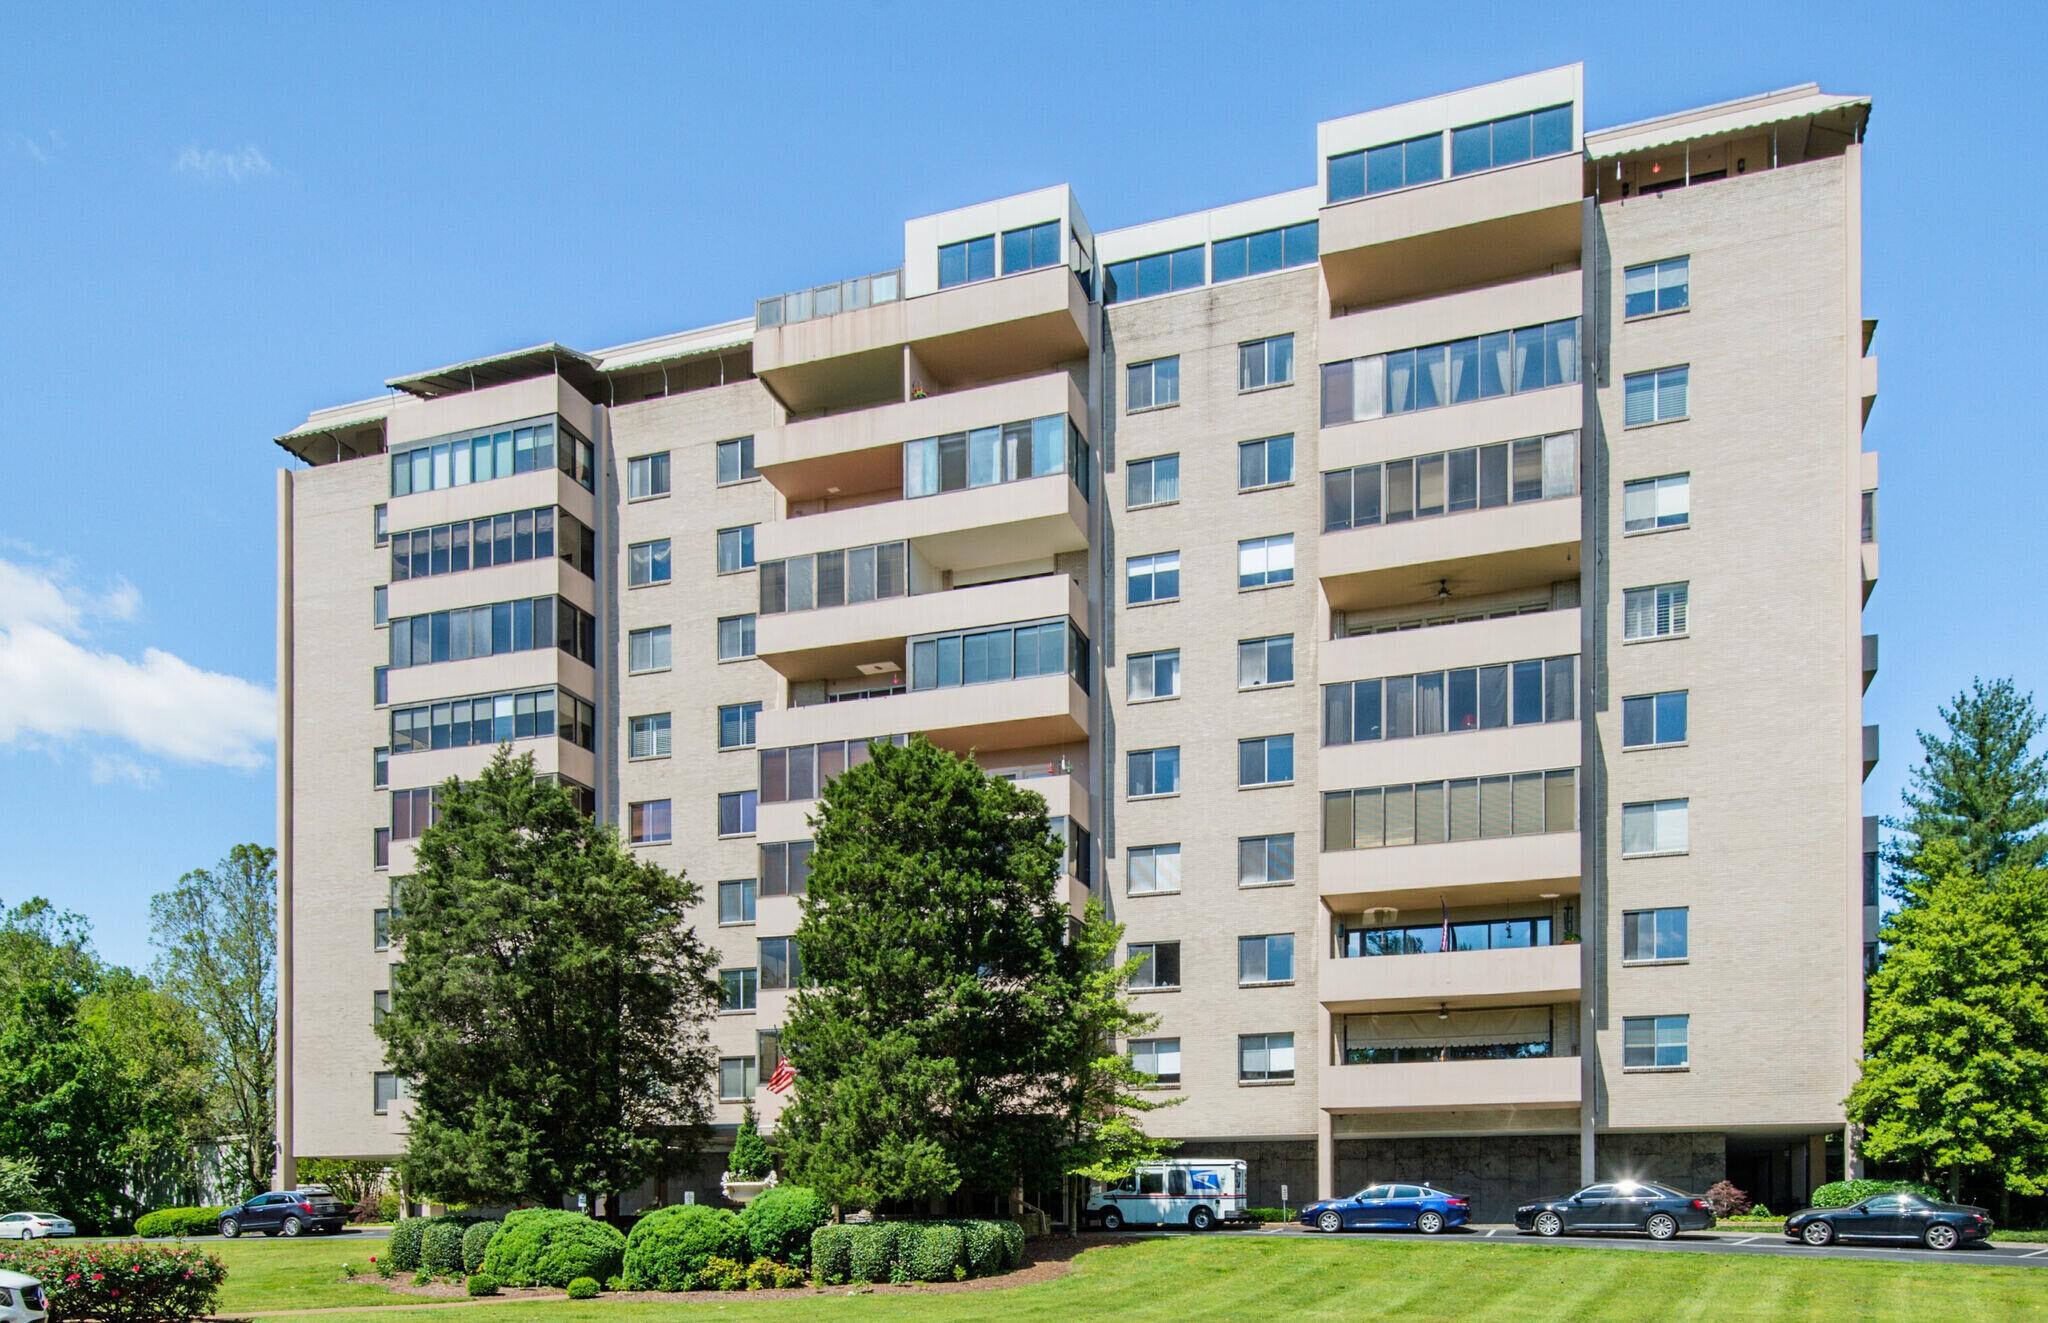 105 Leake Ave #27 Property Photo - Nashville, TN real estate listing